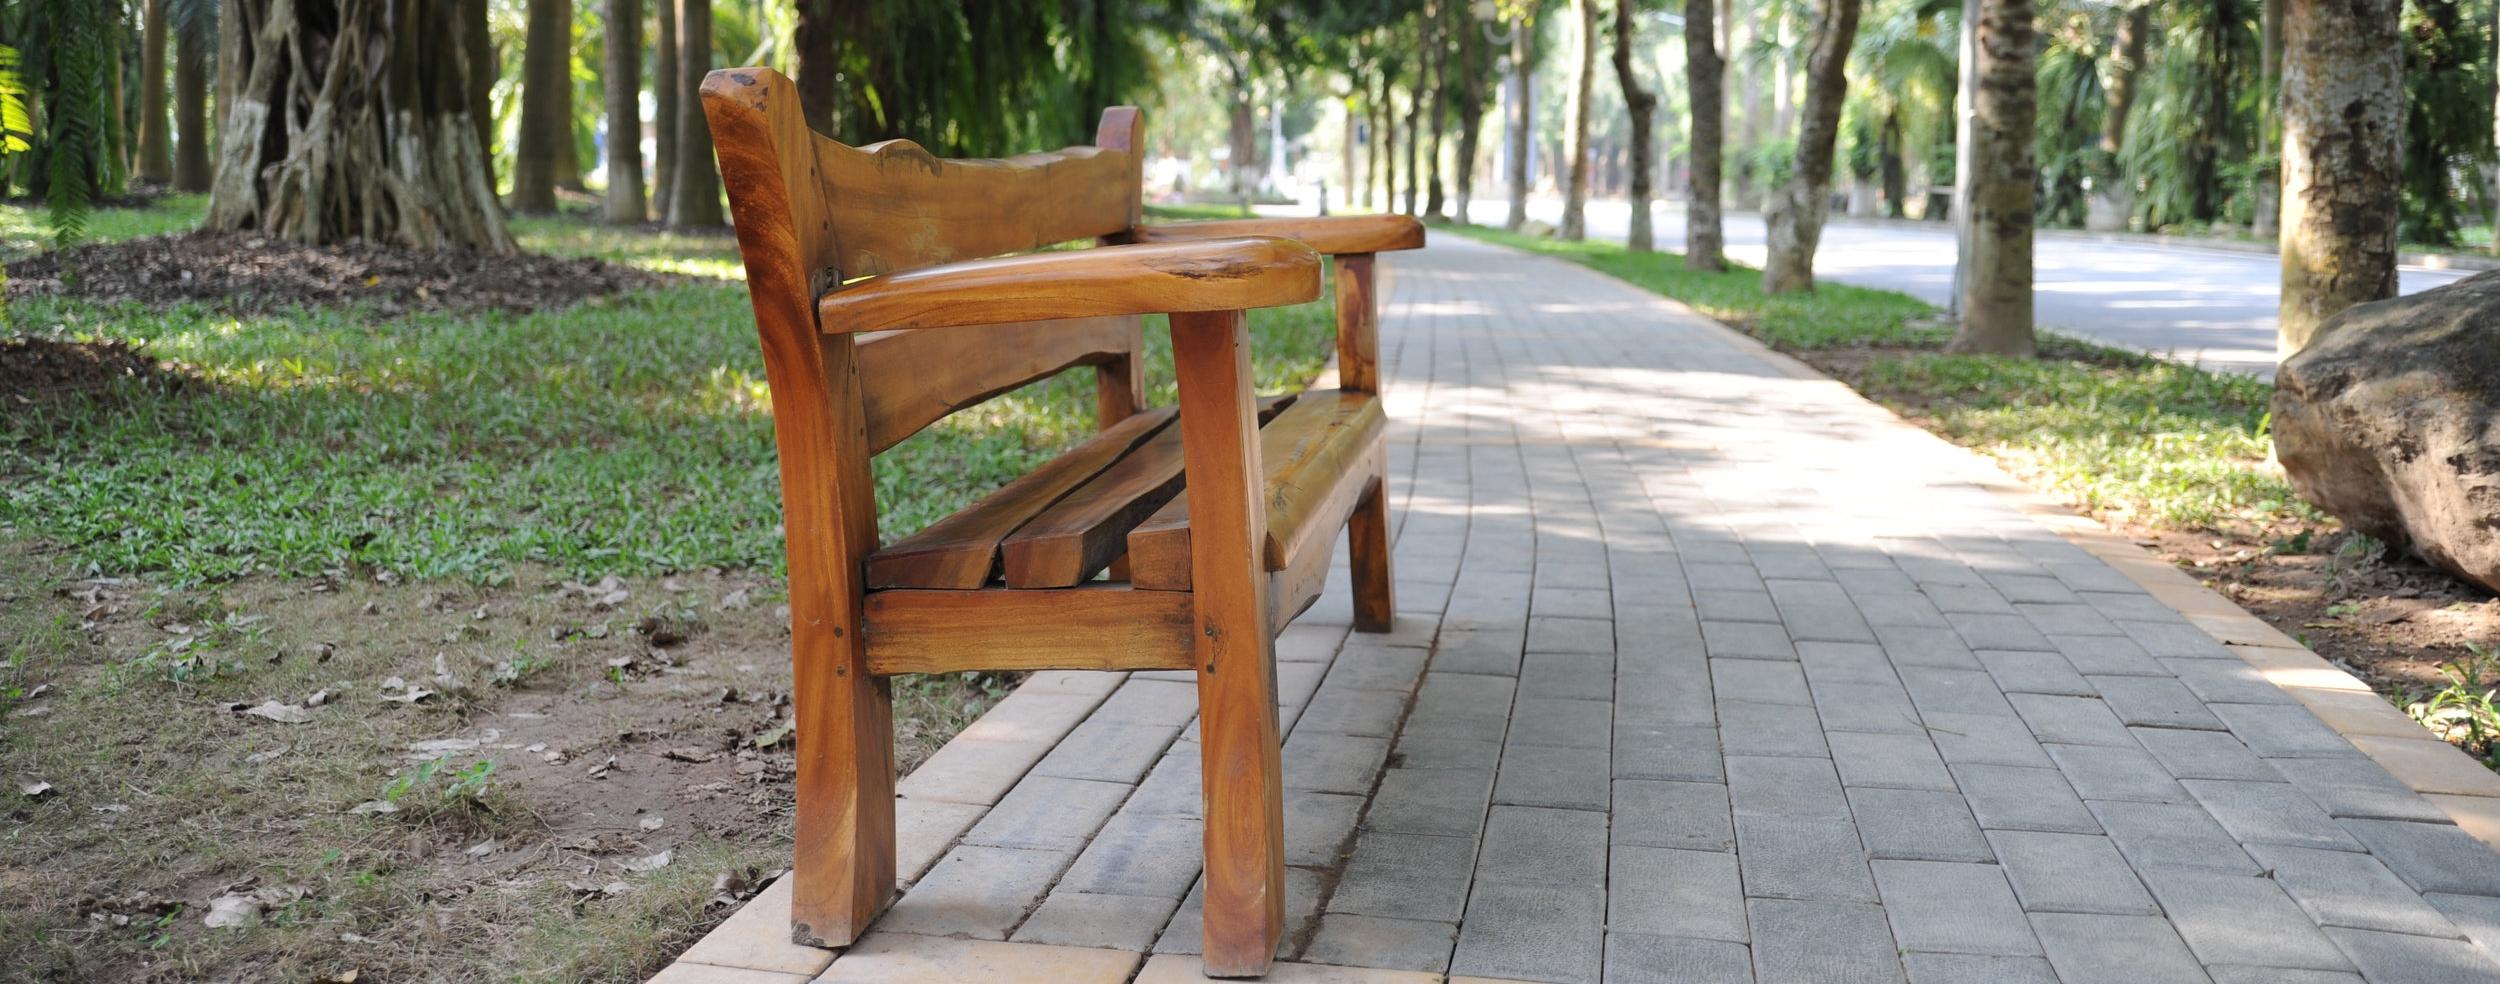 Bench on Path.jpg